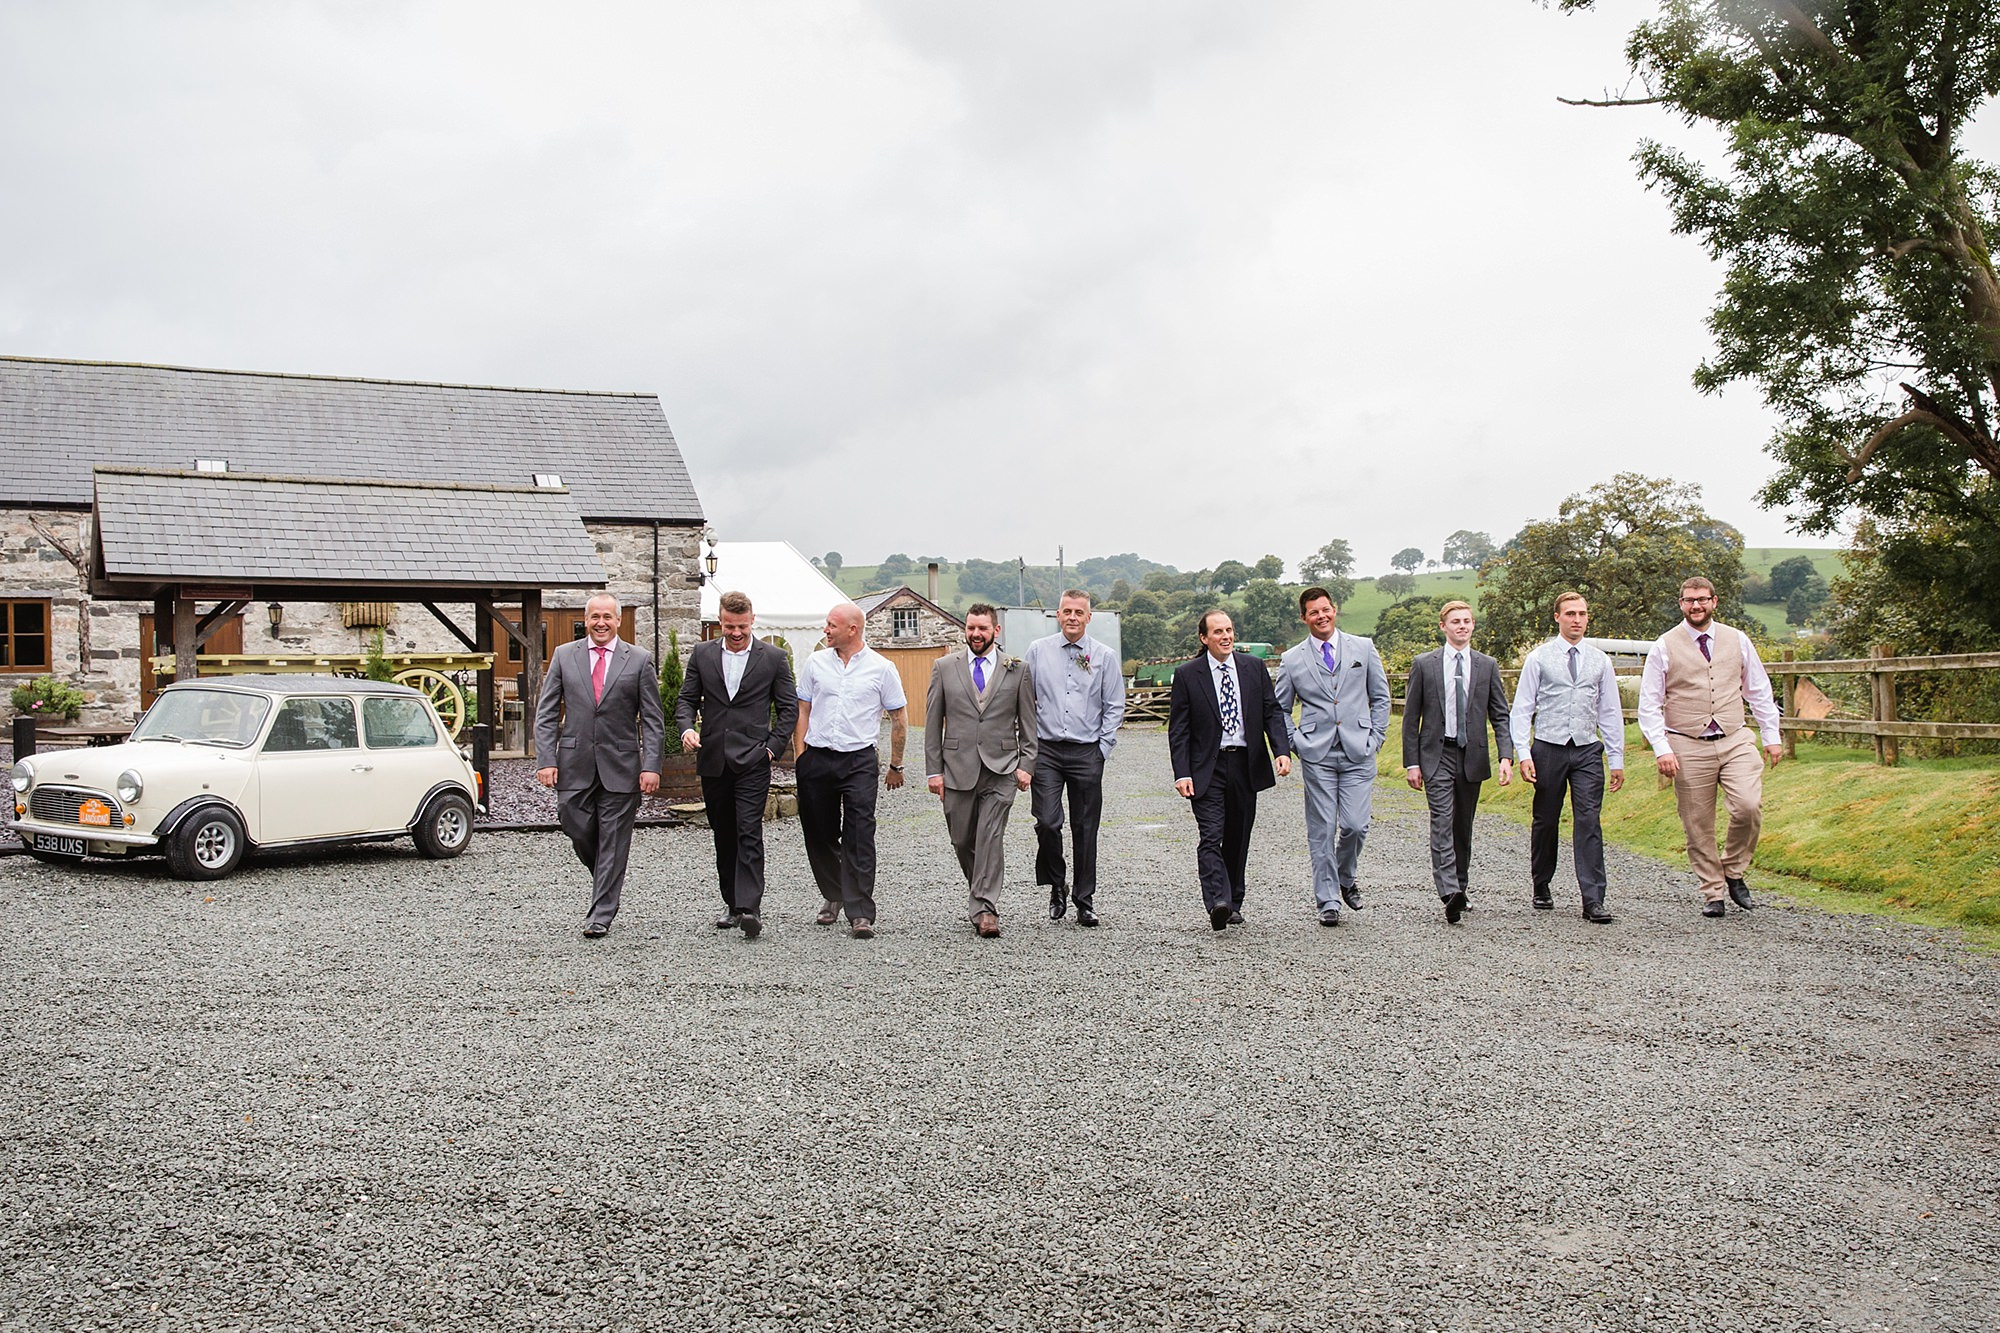 A fun wedding at Plas Isaf - groom and friends walking shot